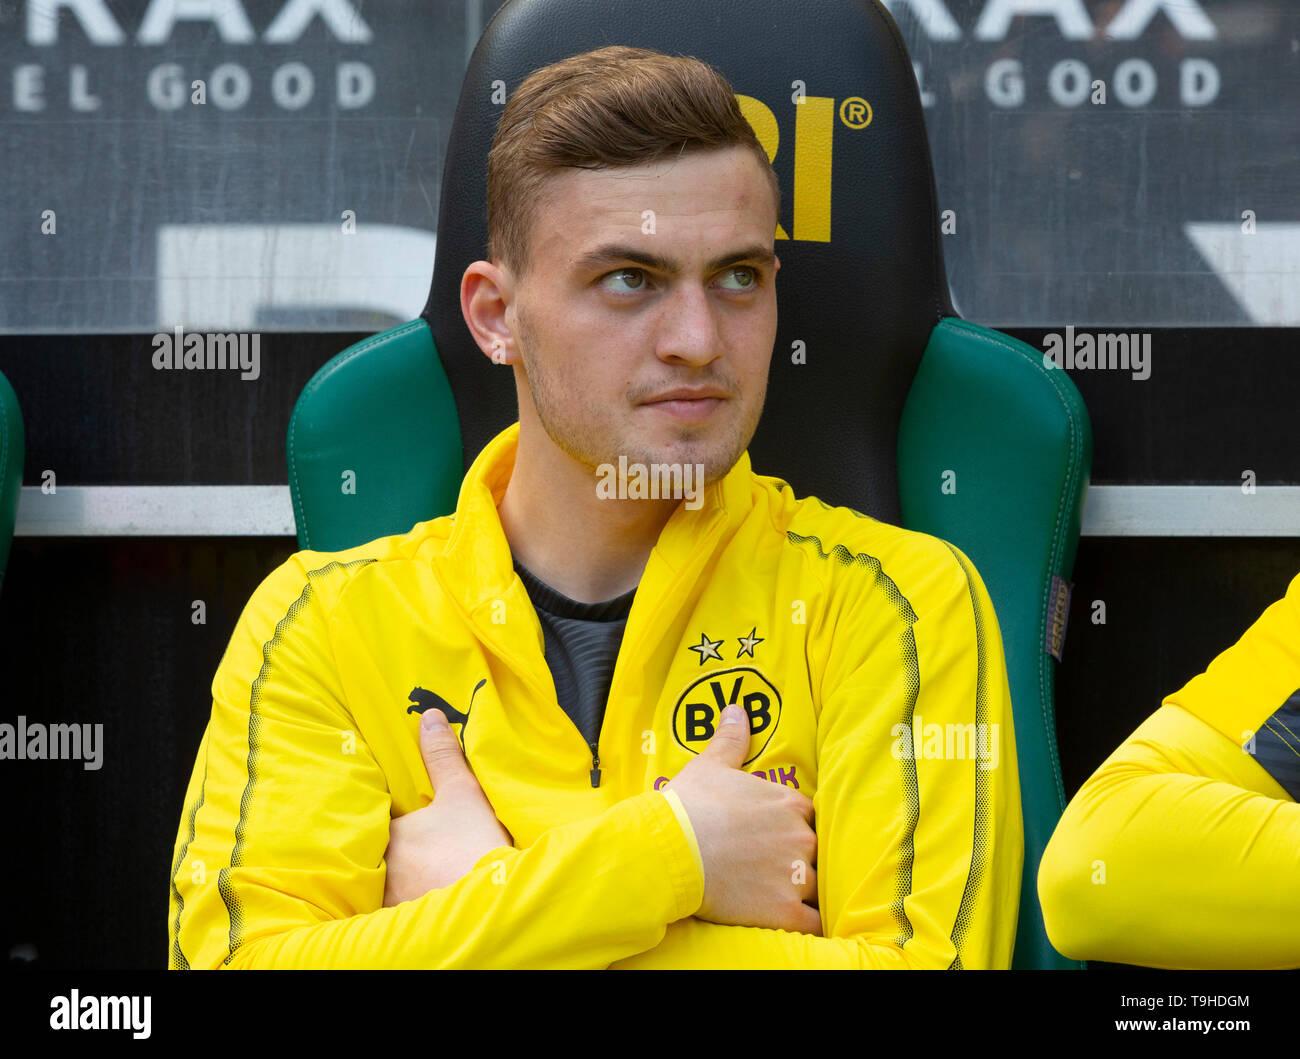 sports, football, Bundesliga, 2018/2019, Borussia Moenchengladbach vs. BVB Borussia Dortmund 0-2, Stadium Borussia Park, players bench, Jacob Bruun Larsen (BVB), DFL REGULATIONS PROHIBIT ANY USE OF PHOTOGRAPHS AS IMAGE SEQUENCES AND/OR QUASI-VIDEO - Stock Image